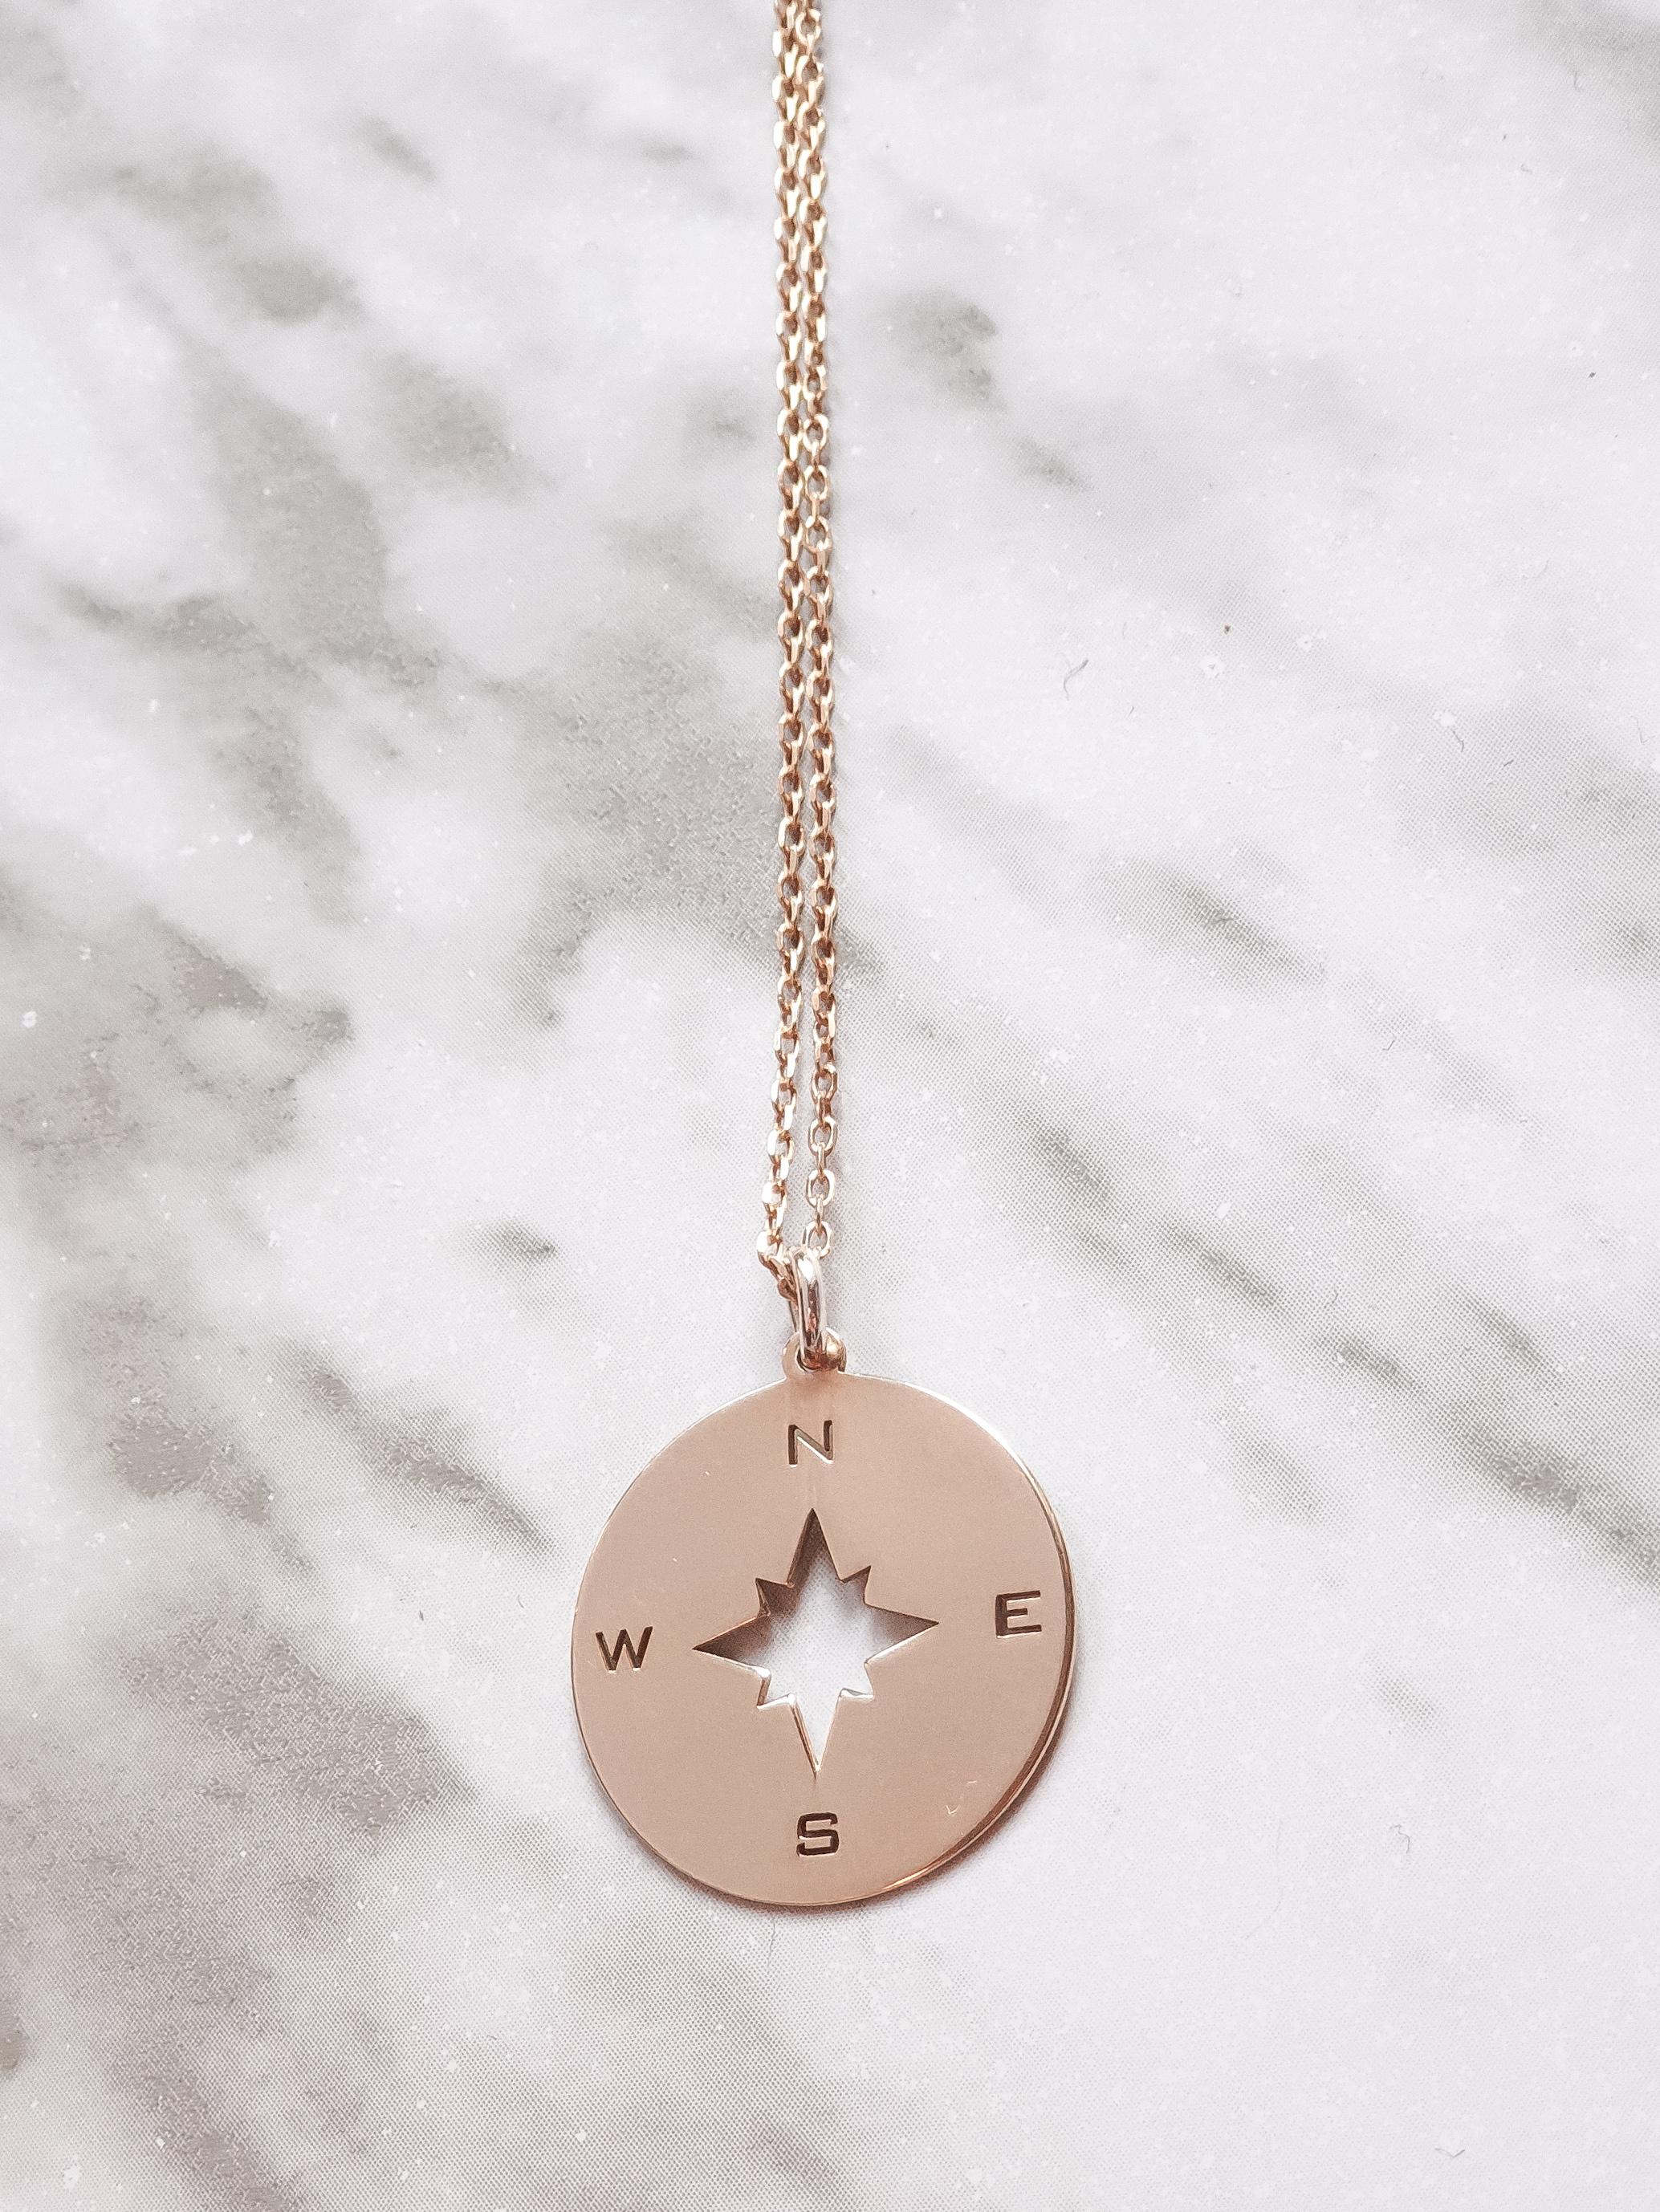 Medalla brújula dorada - María Dosaes